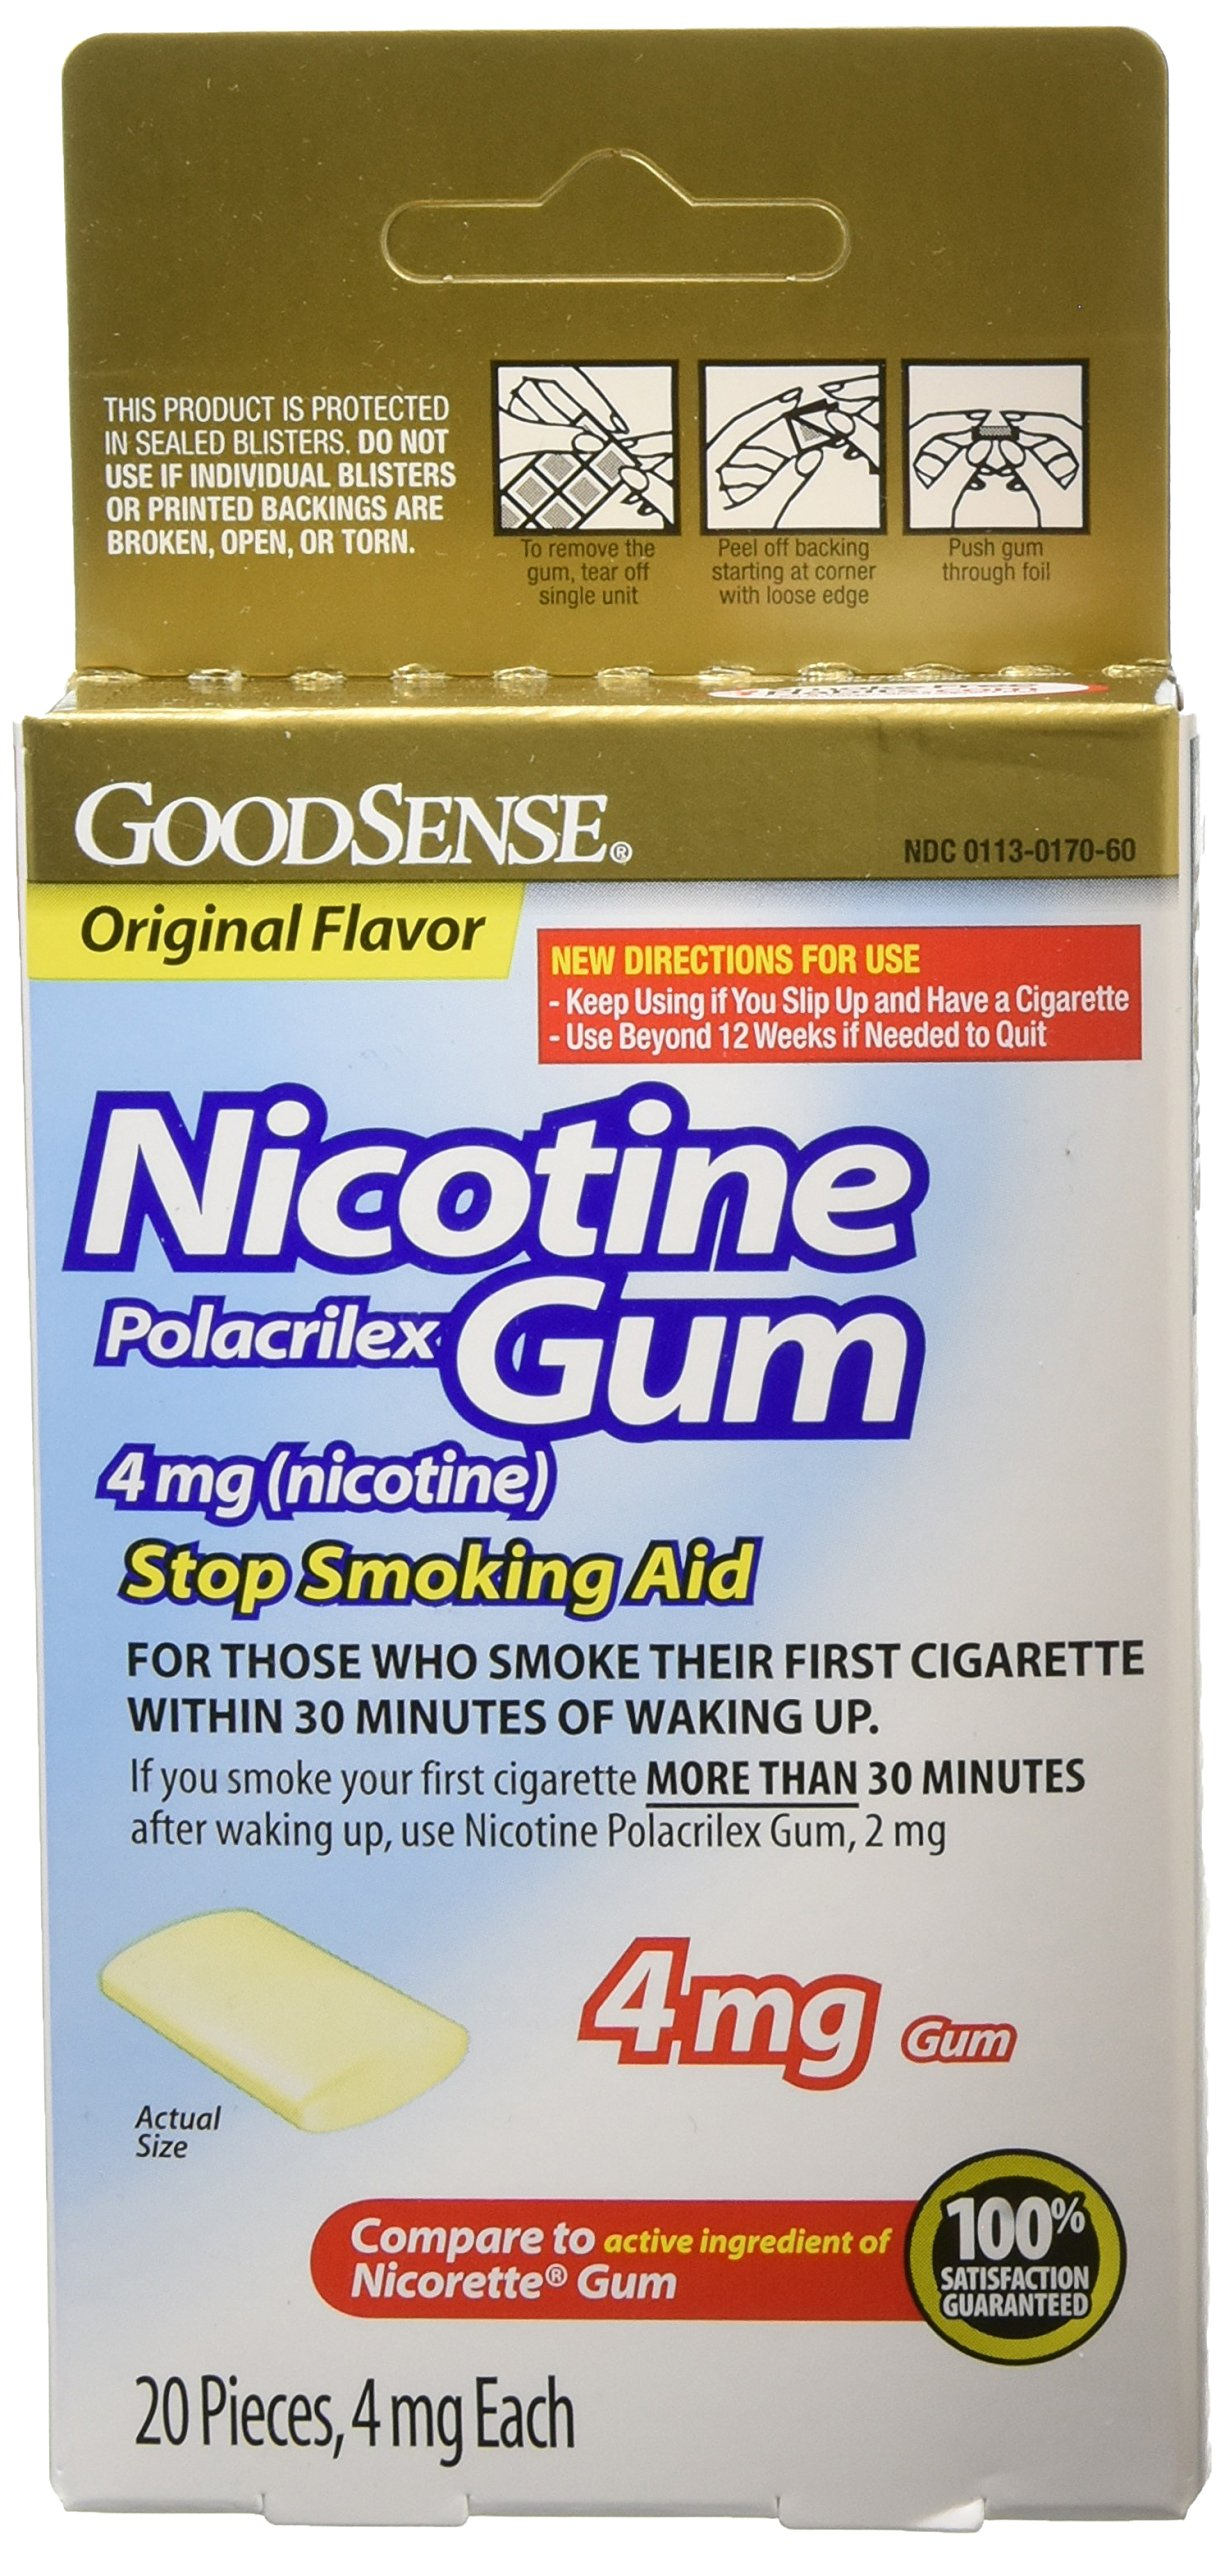 Good Sense Nicotine Polacrilex Gum, 20 Count (Pack of 24) by Good Sense